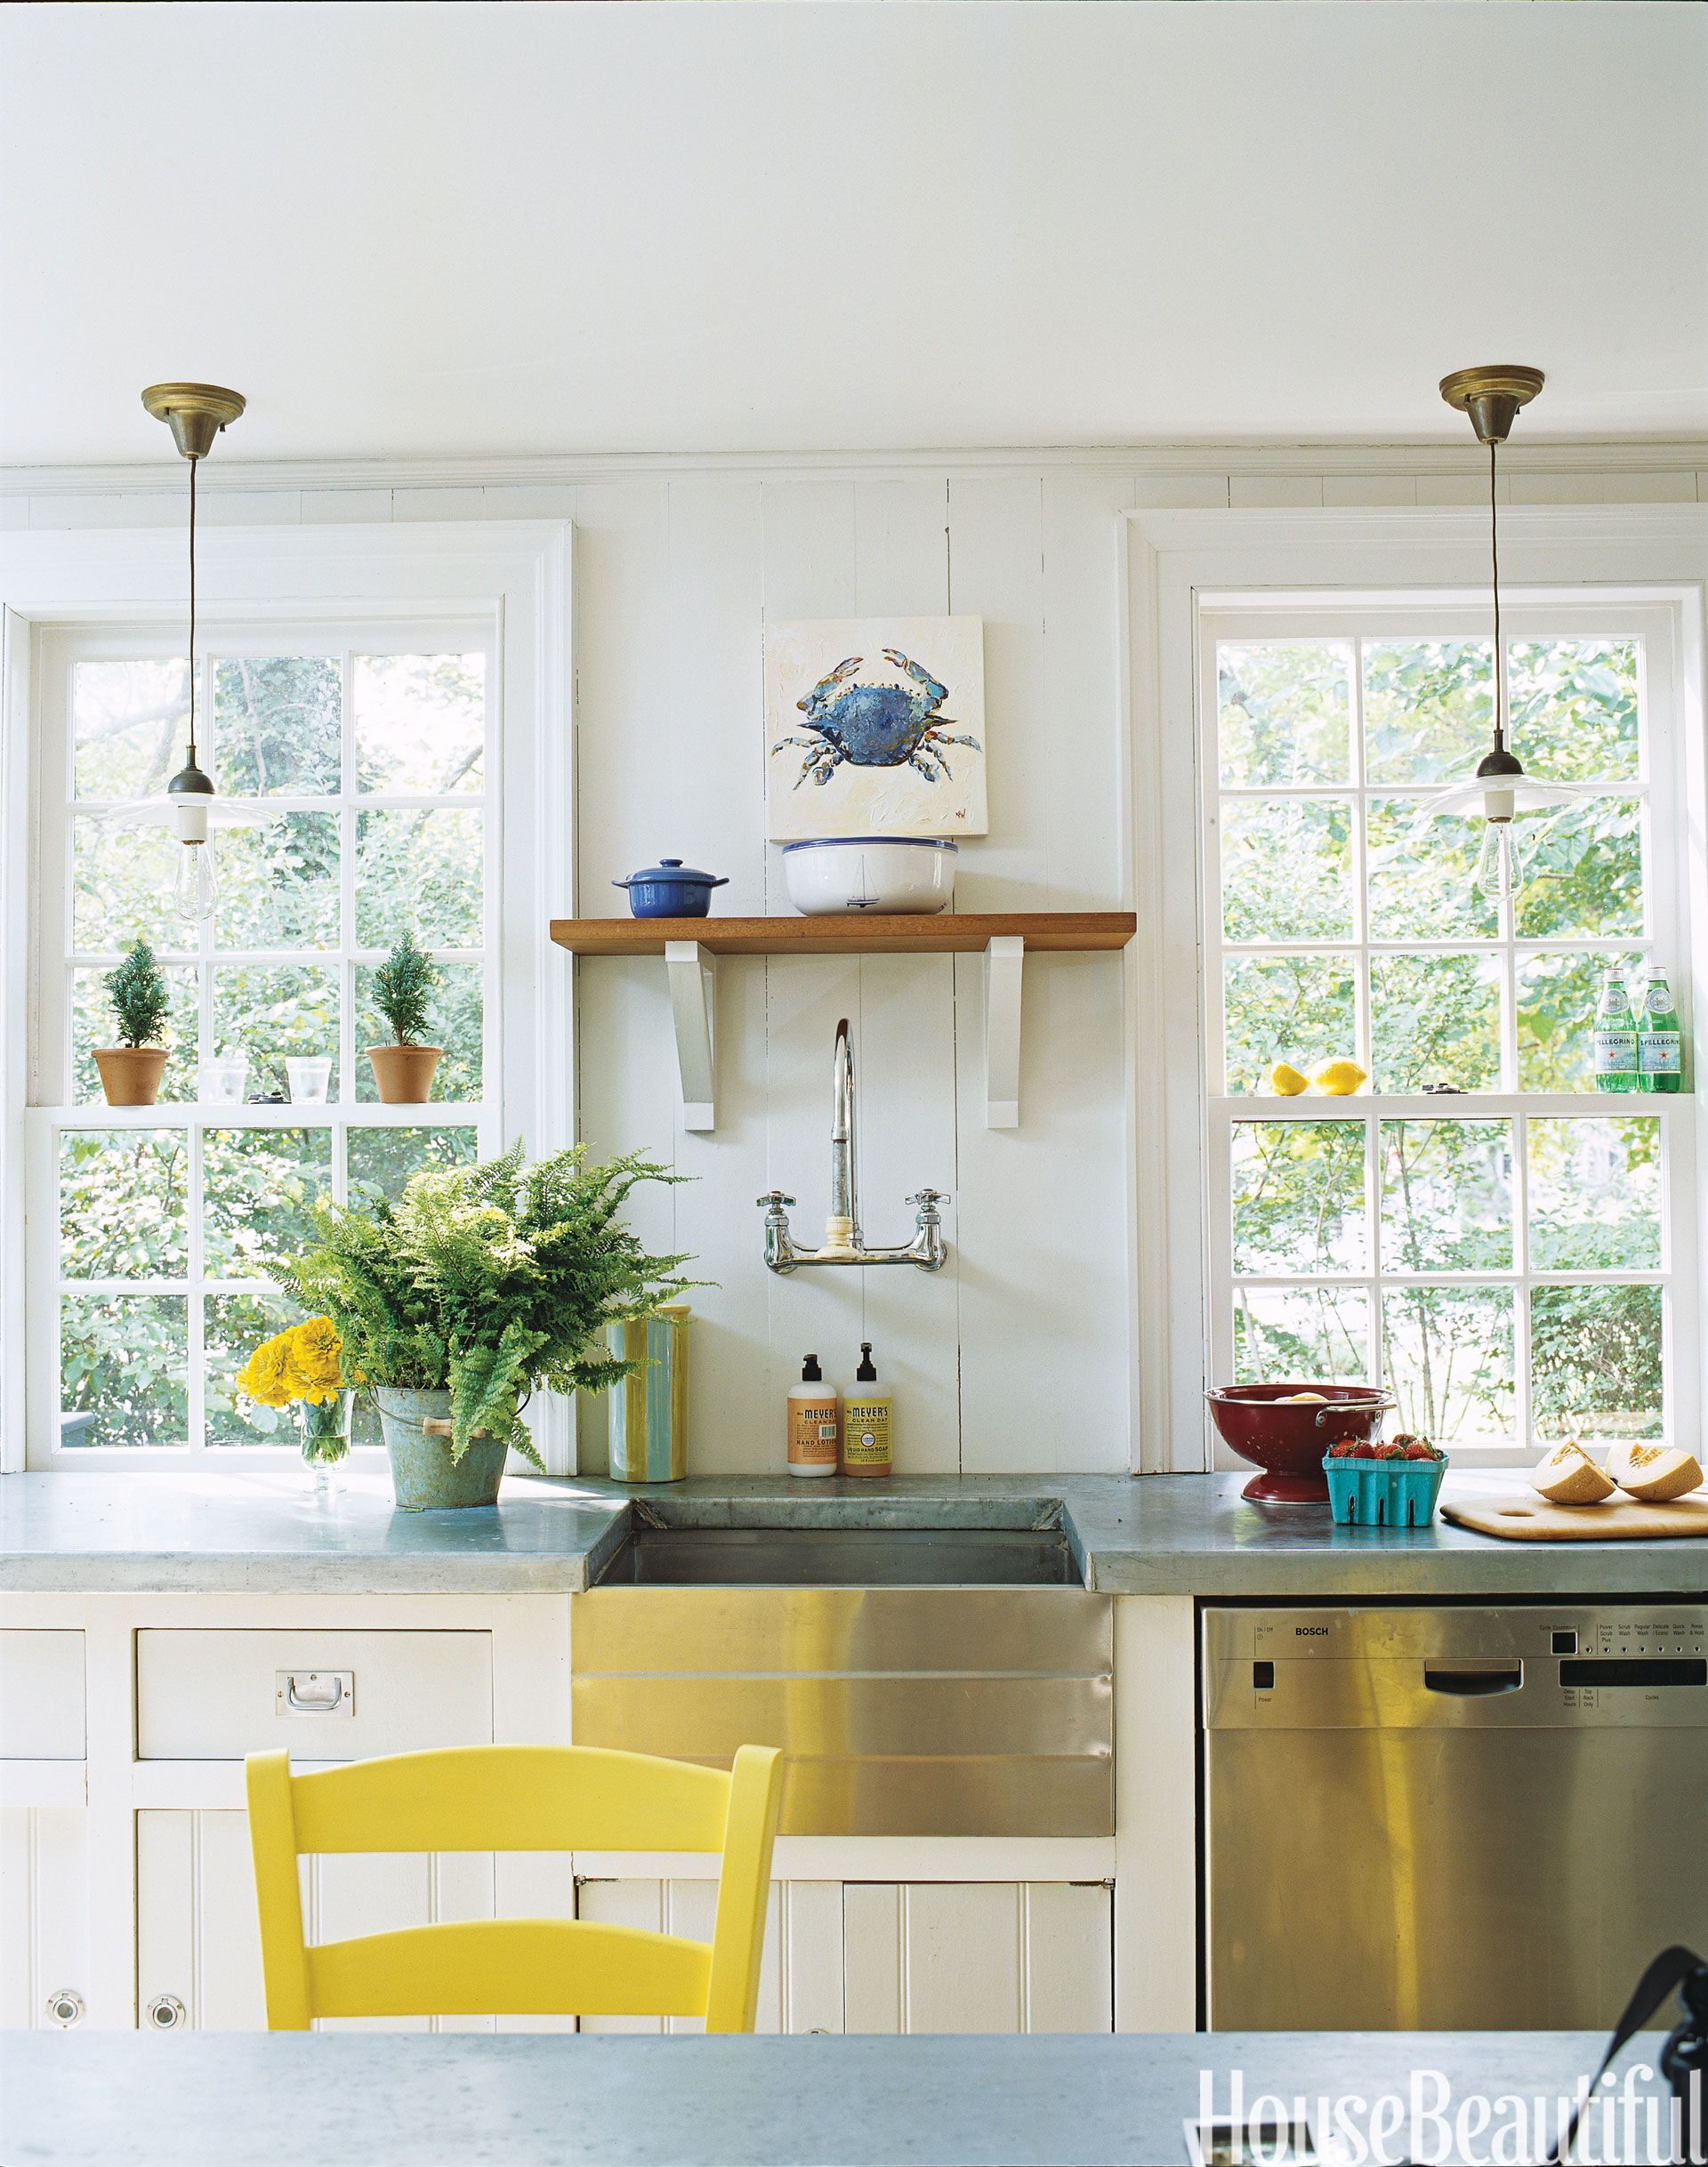 20+ Best Kitchen Countertops Design Ideas - Types of Kitchen Counters